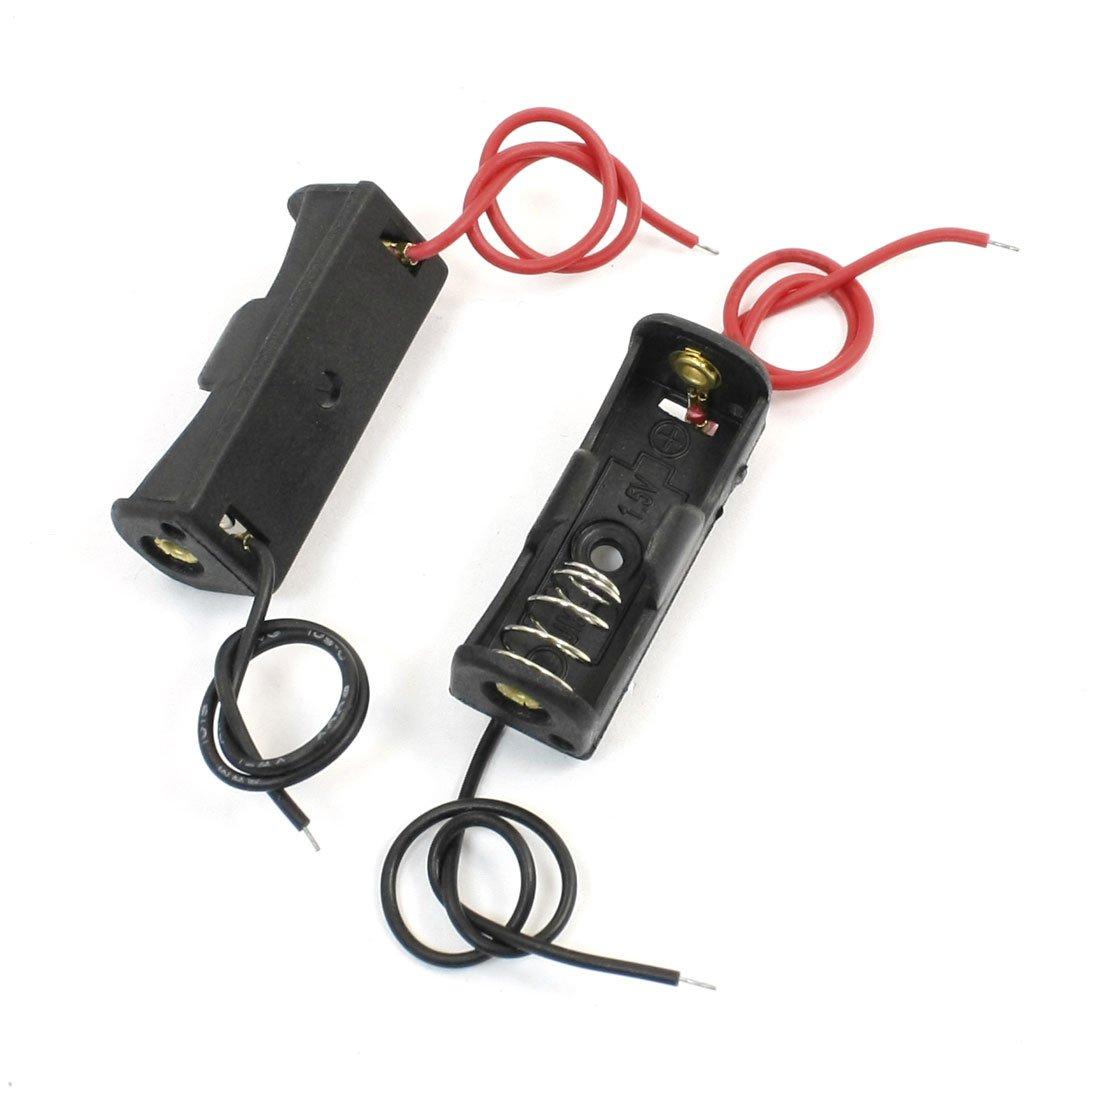 SODIAL 5 Stk Schwarze Halter-Kaesten fuer 23A//A23 Batterie R